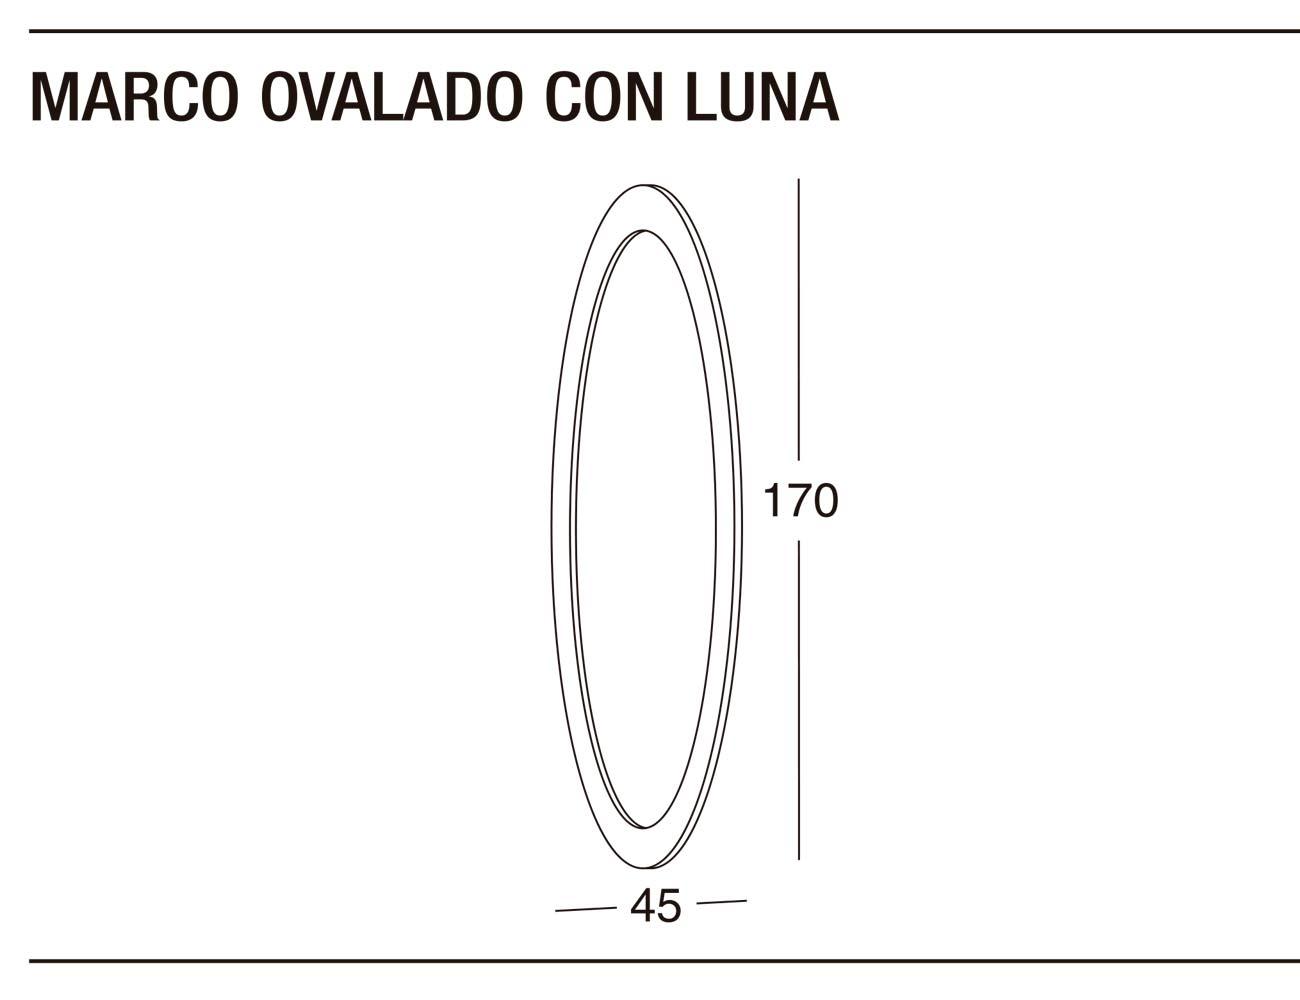 Marco ovalado luna 45x170